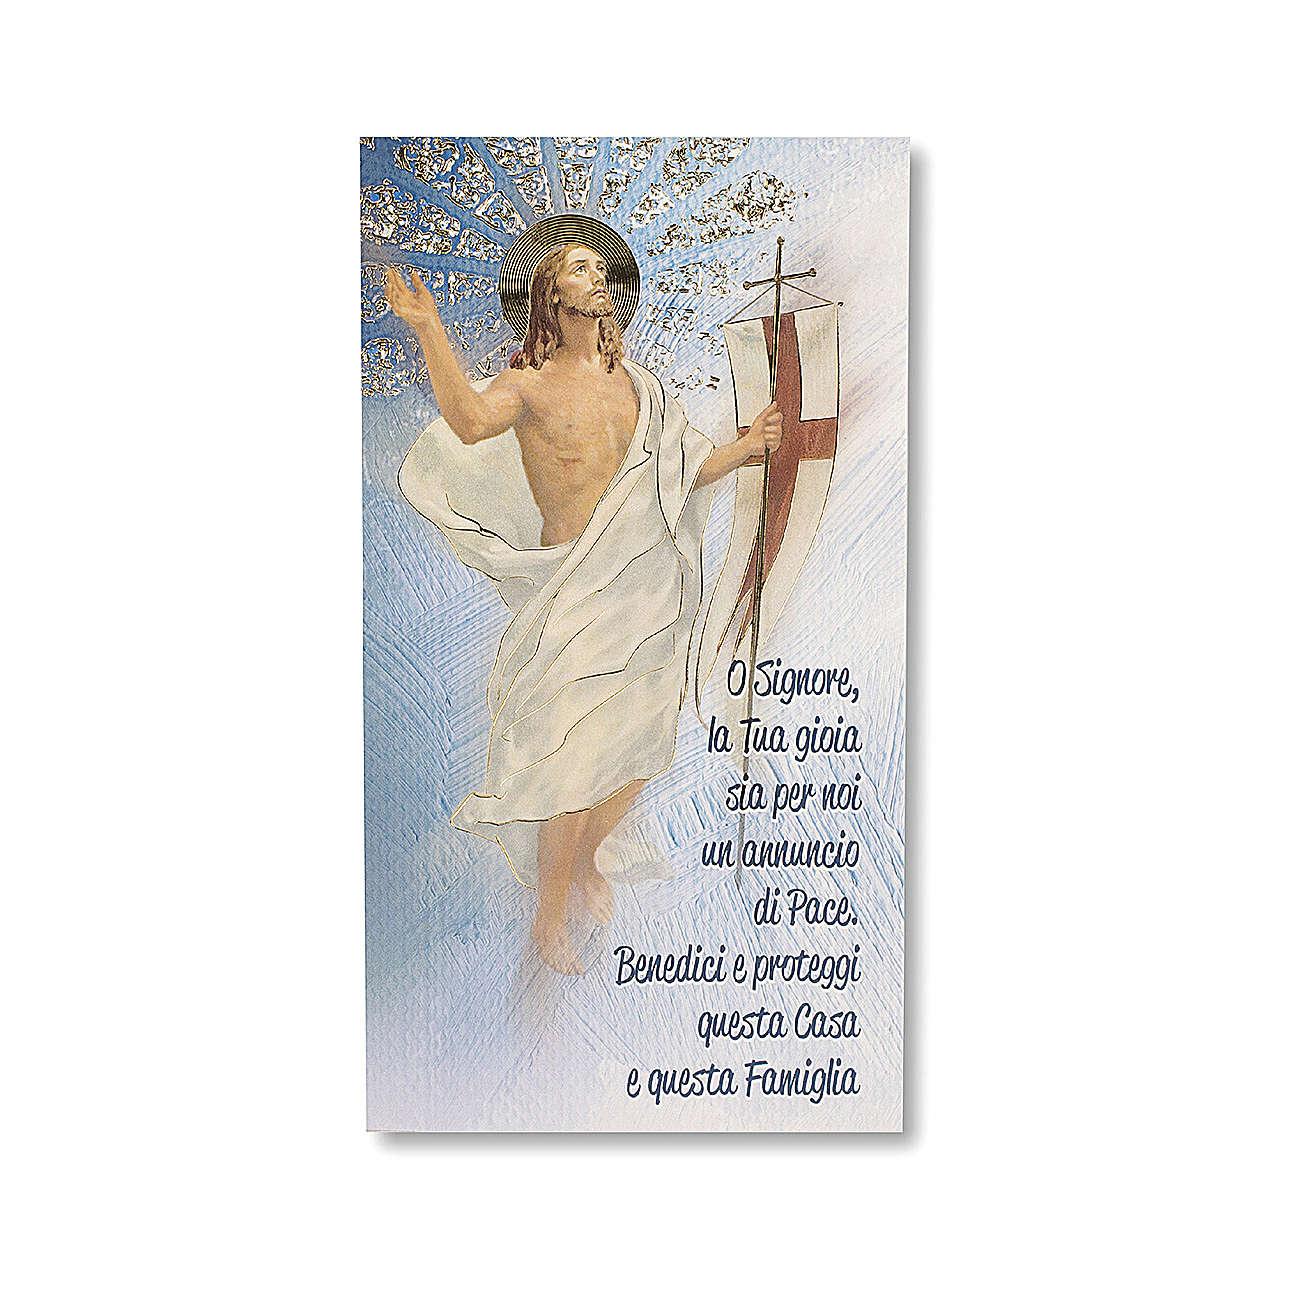 House Blessing pasteboard the Resurrection of Christ ITALIAN 3